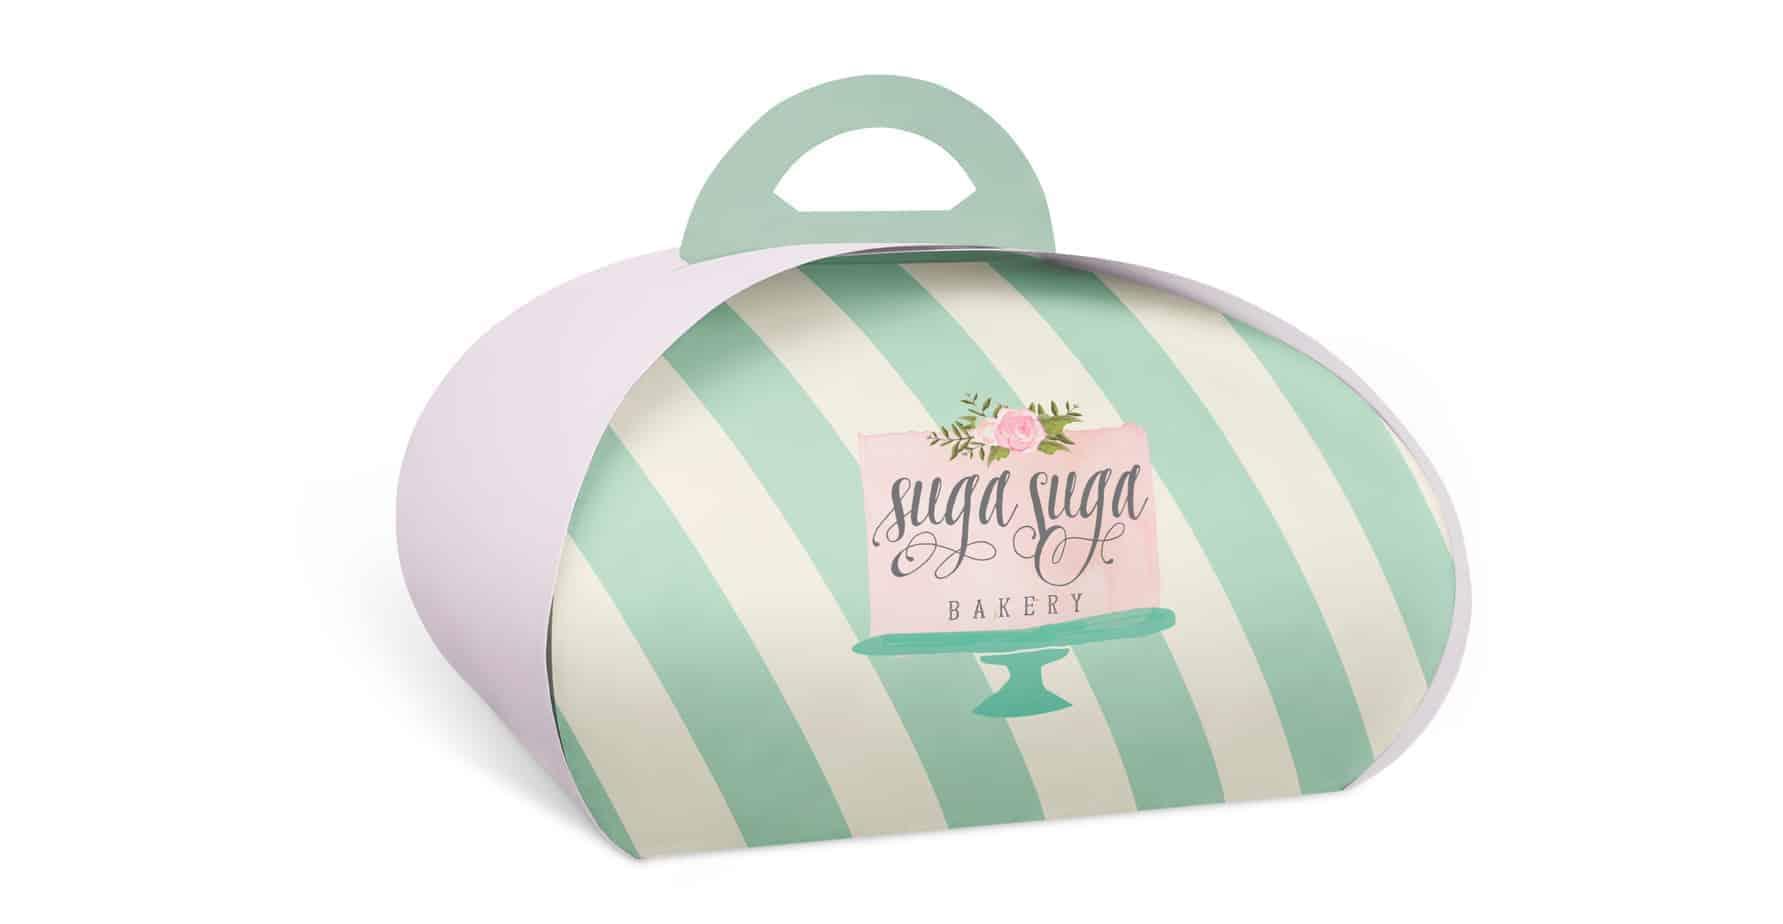 Suga Suga Bakery Custom Printed Cake Boxes - Dome